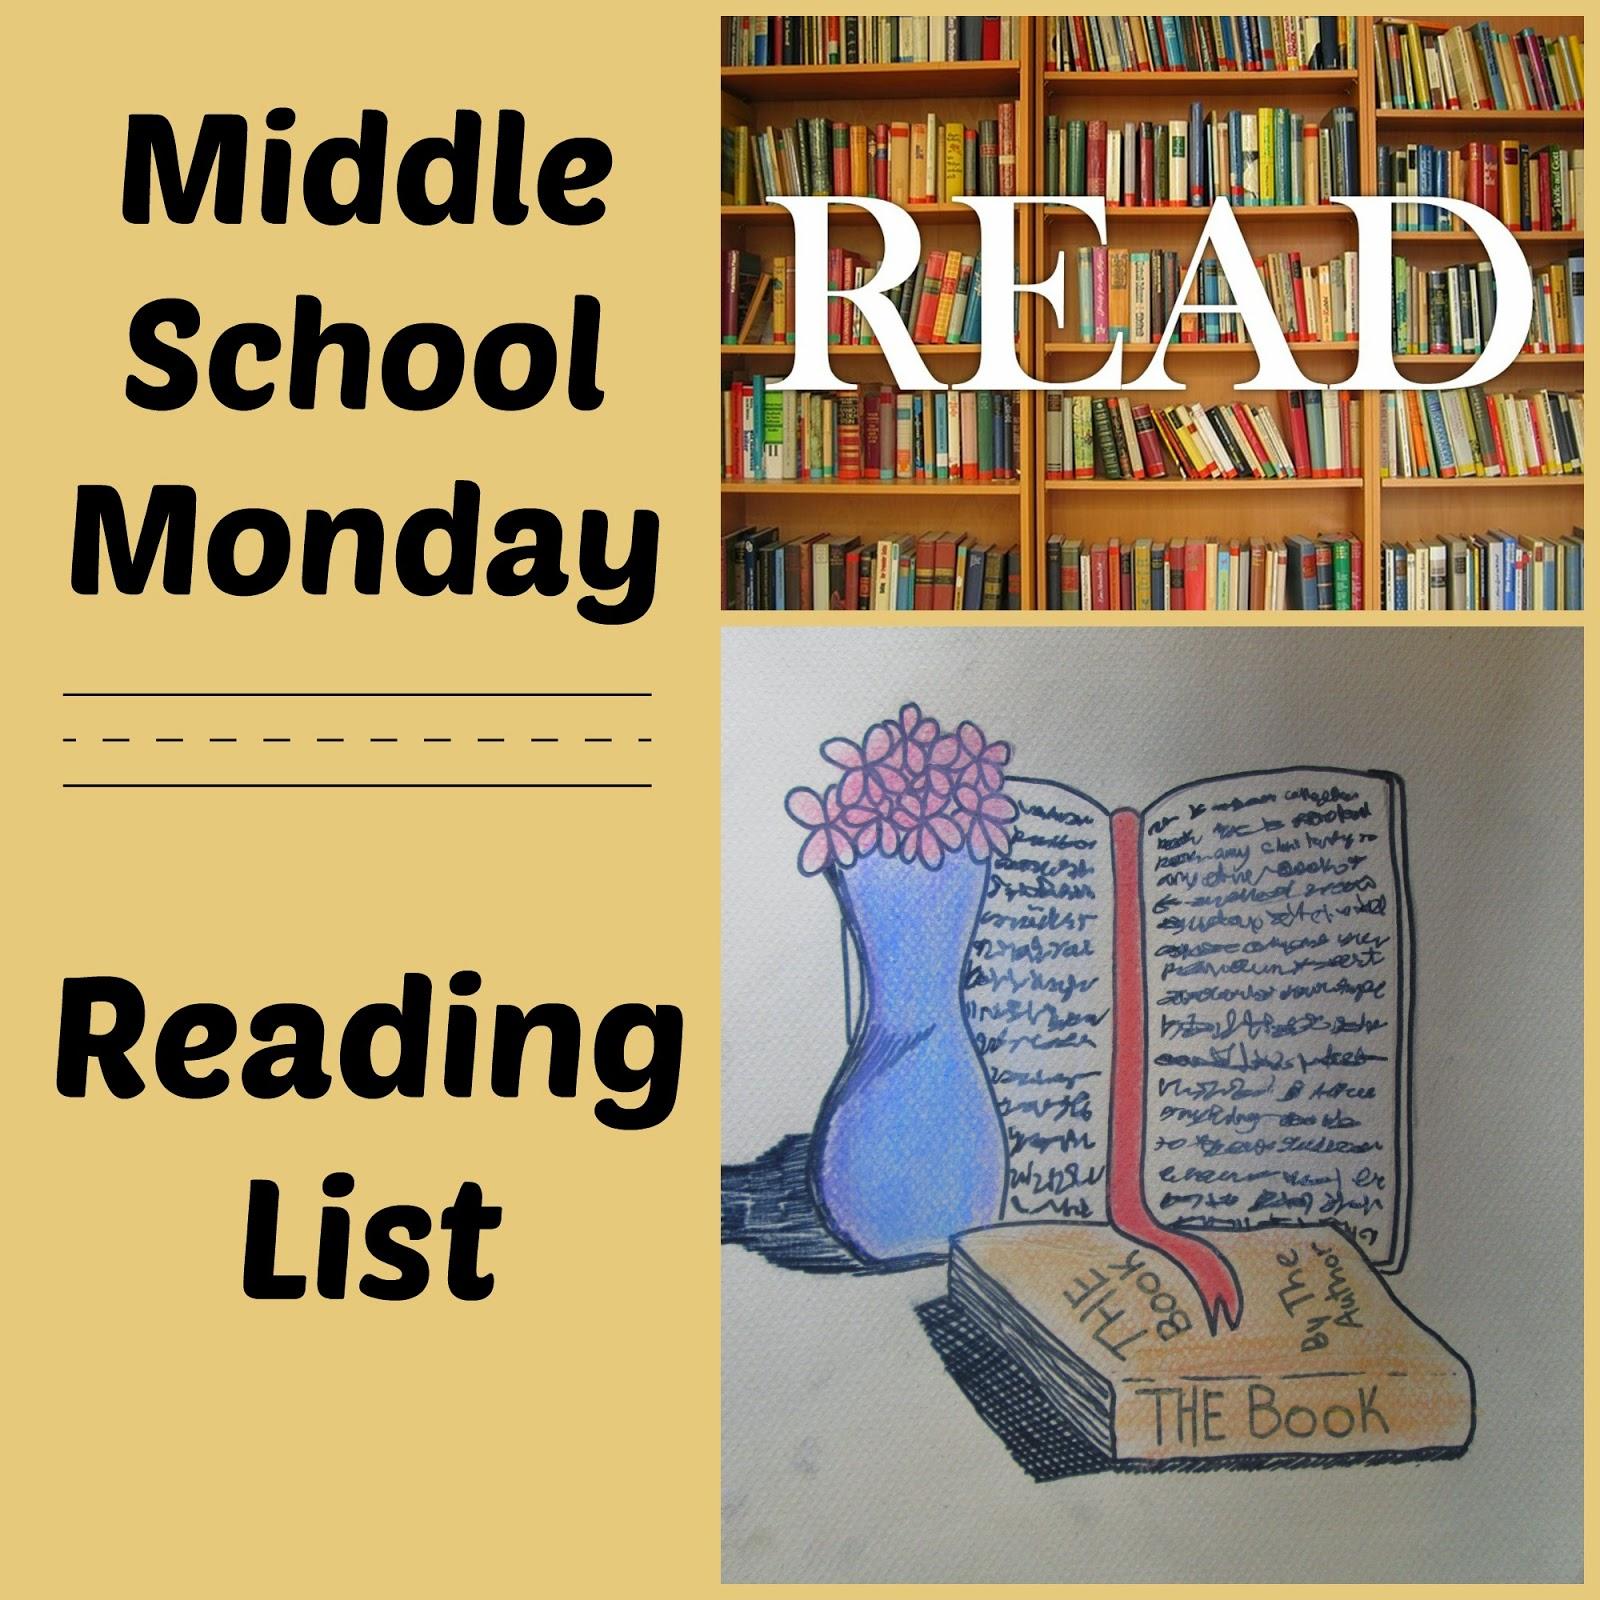 Middle School Monday Reading List @ kympossibleblog.blogspot.com